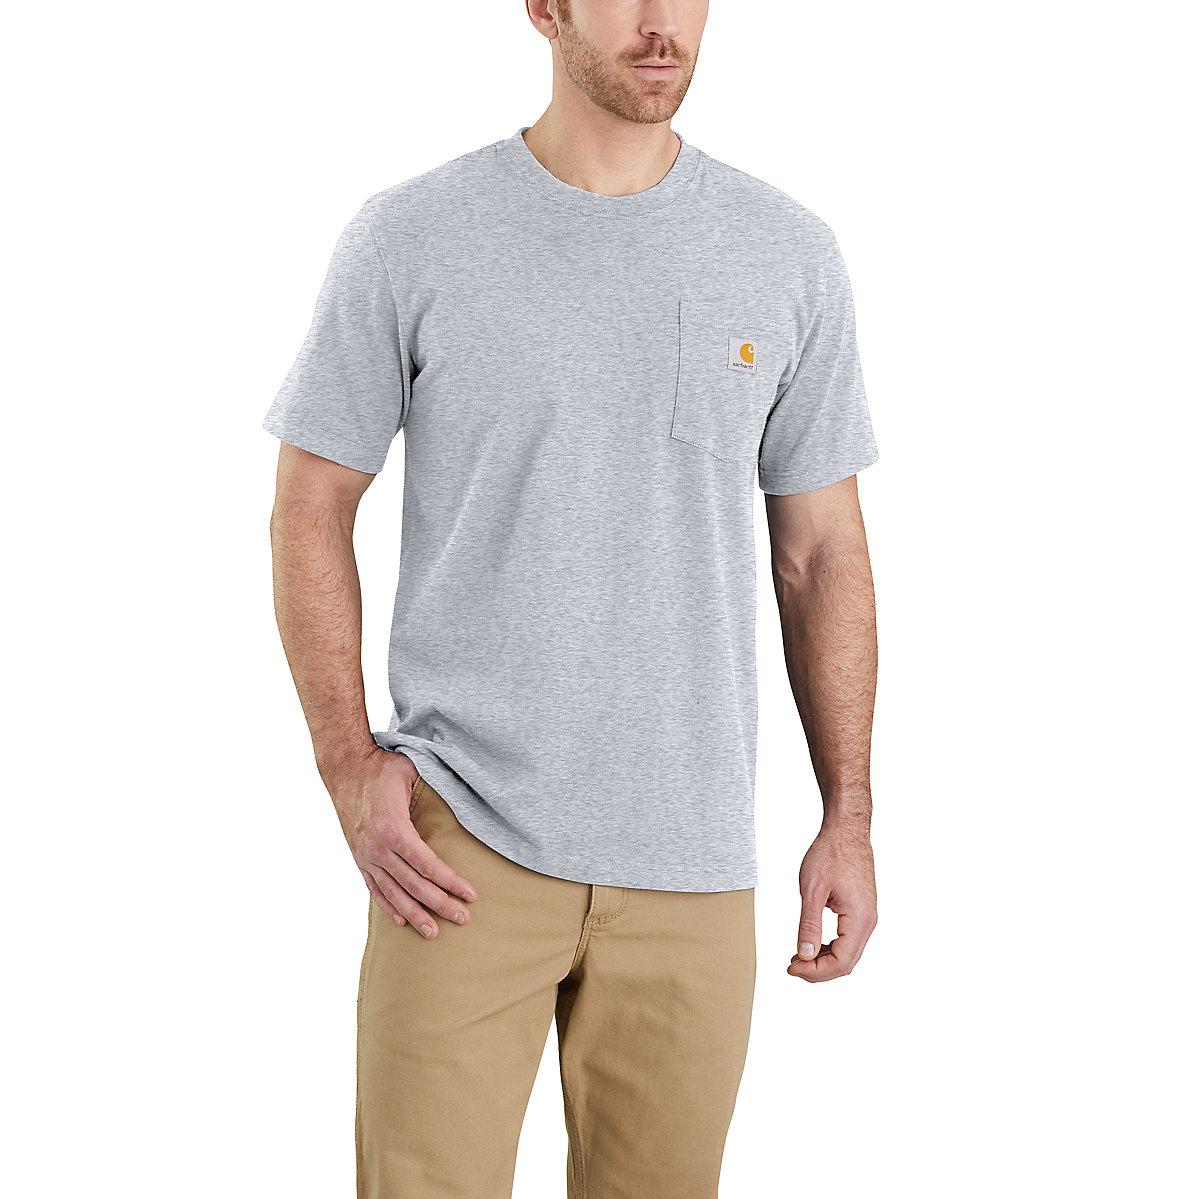 0ee471006f48 Men′s WORKWEAR POCKET SHORT-SLEEVE T-SHIRT 103296 | Carhartt